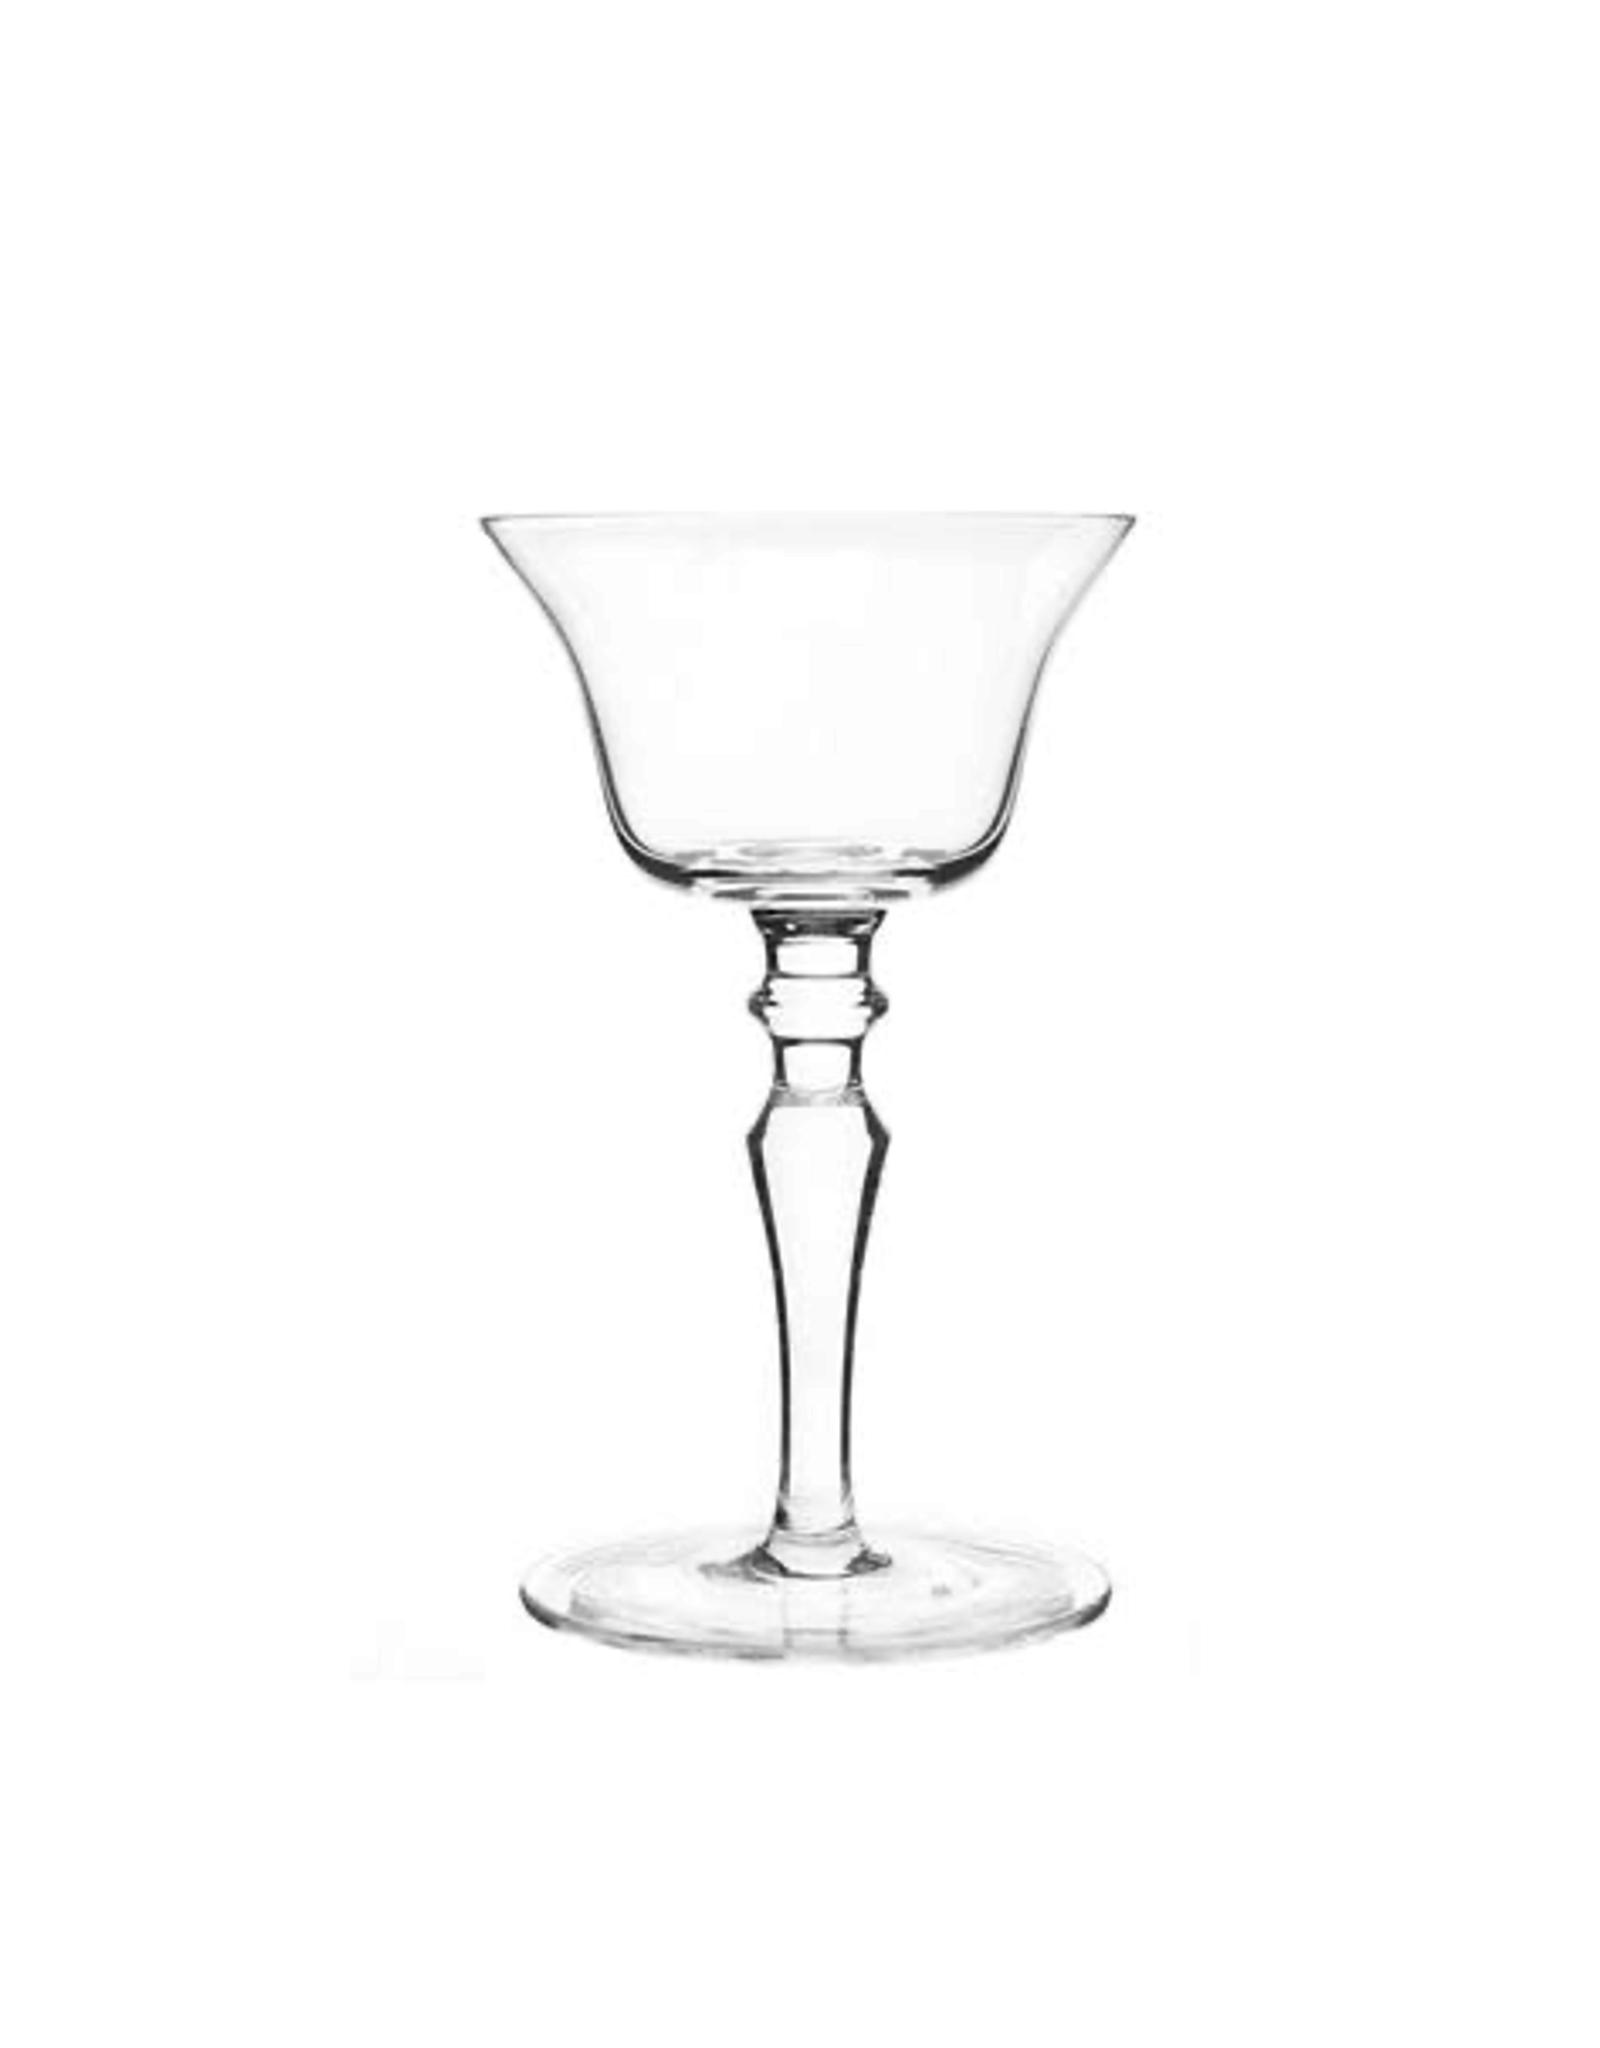 JMI - Petite Coupe Glass  4.5oz